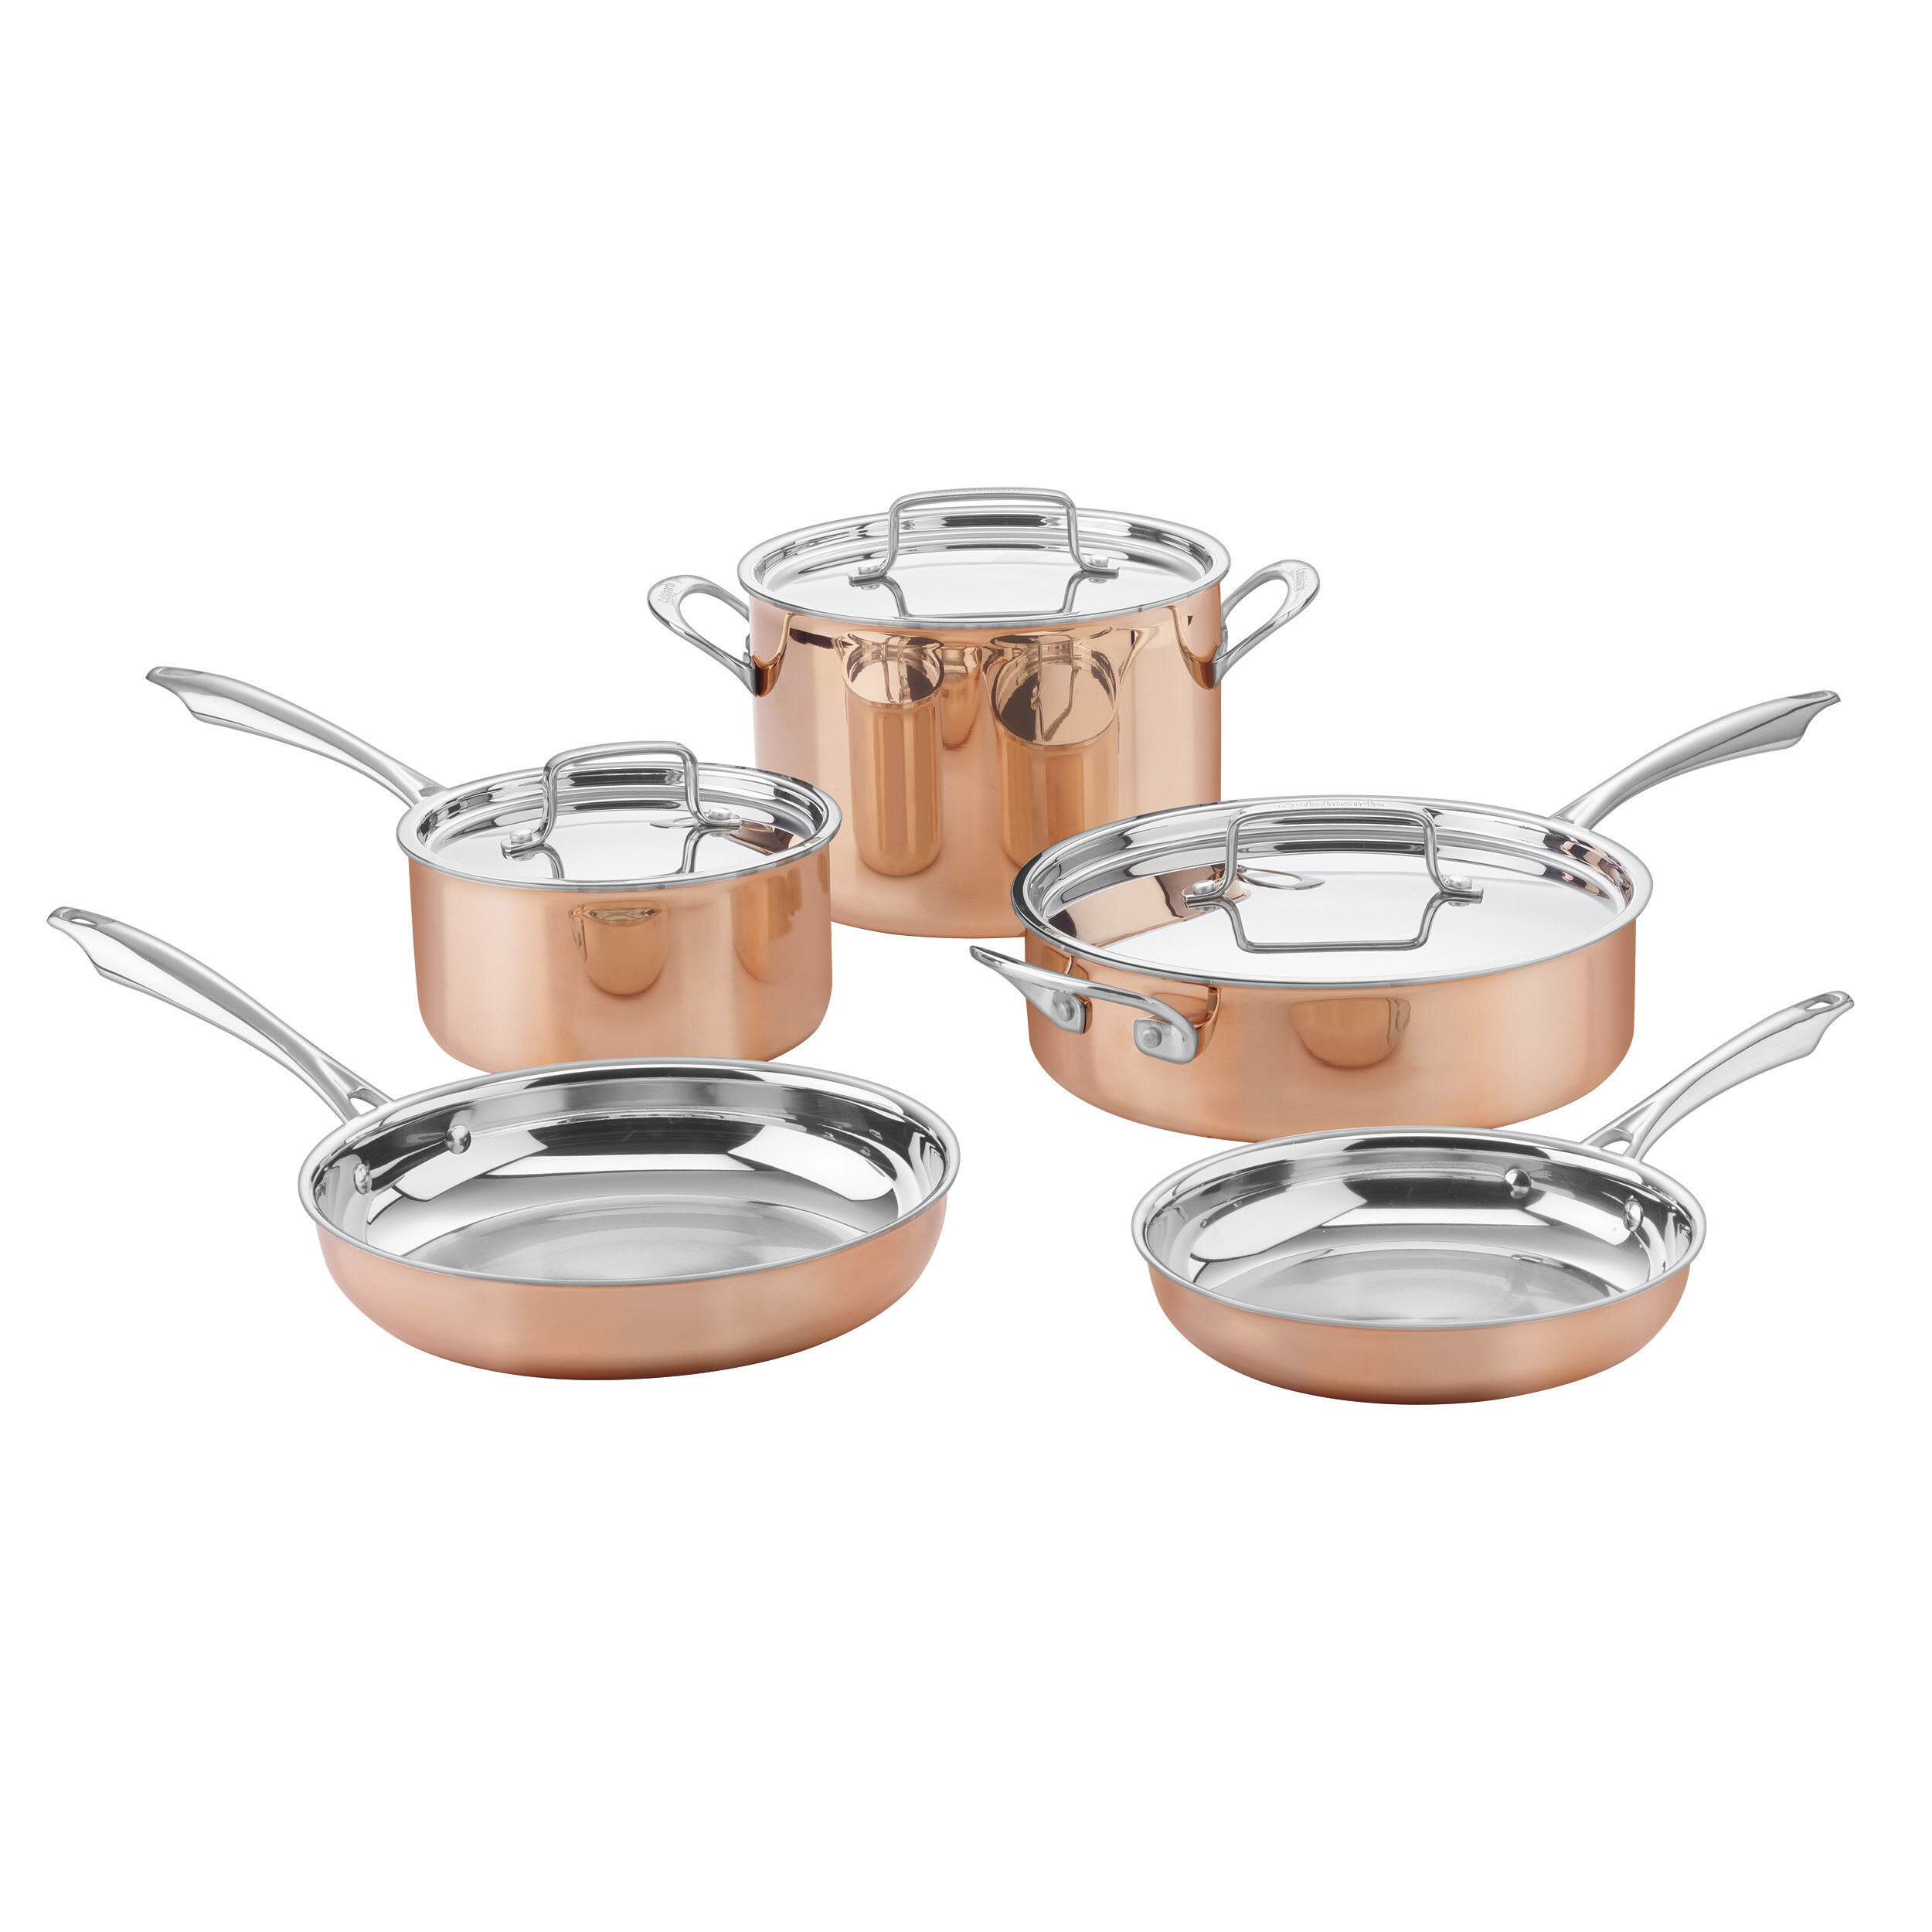 Cuisinart 8-Piece Tri-Ply Cookware Set